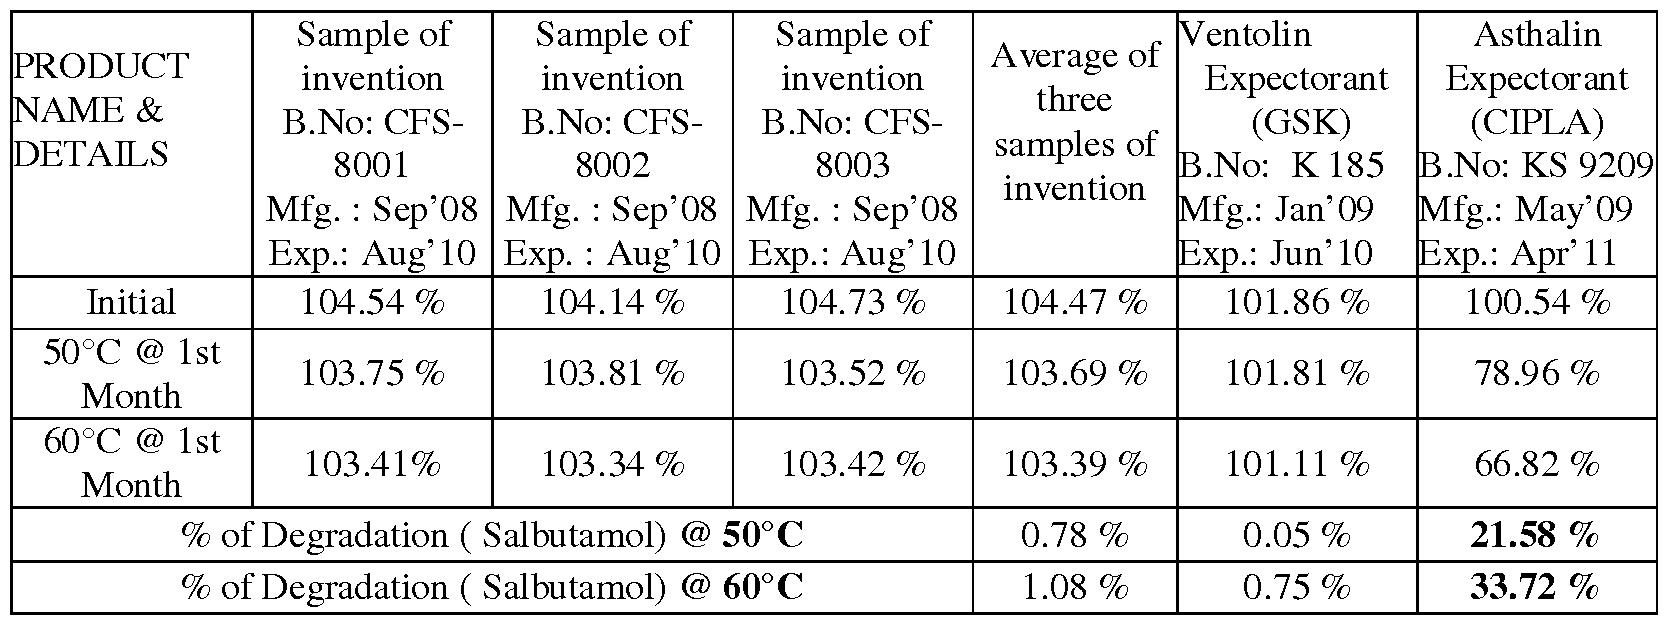 Ventolin samples